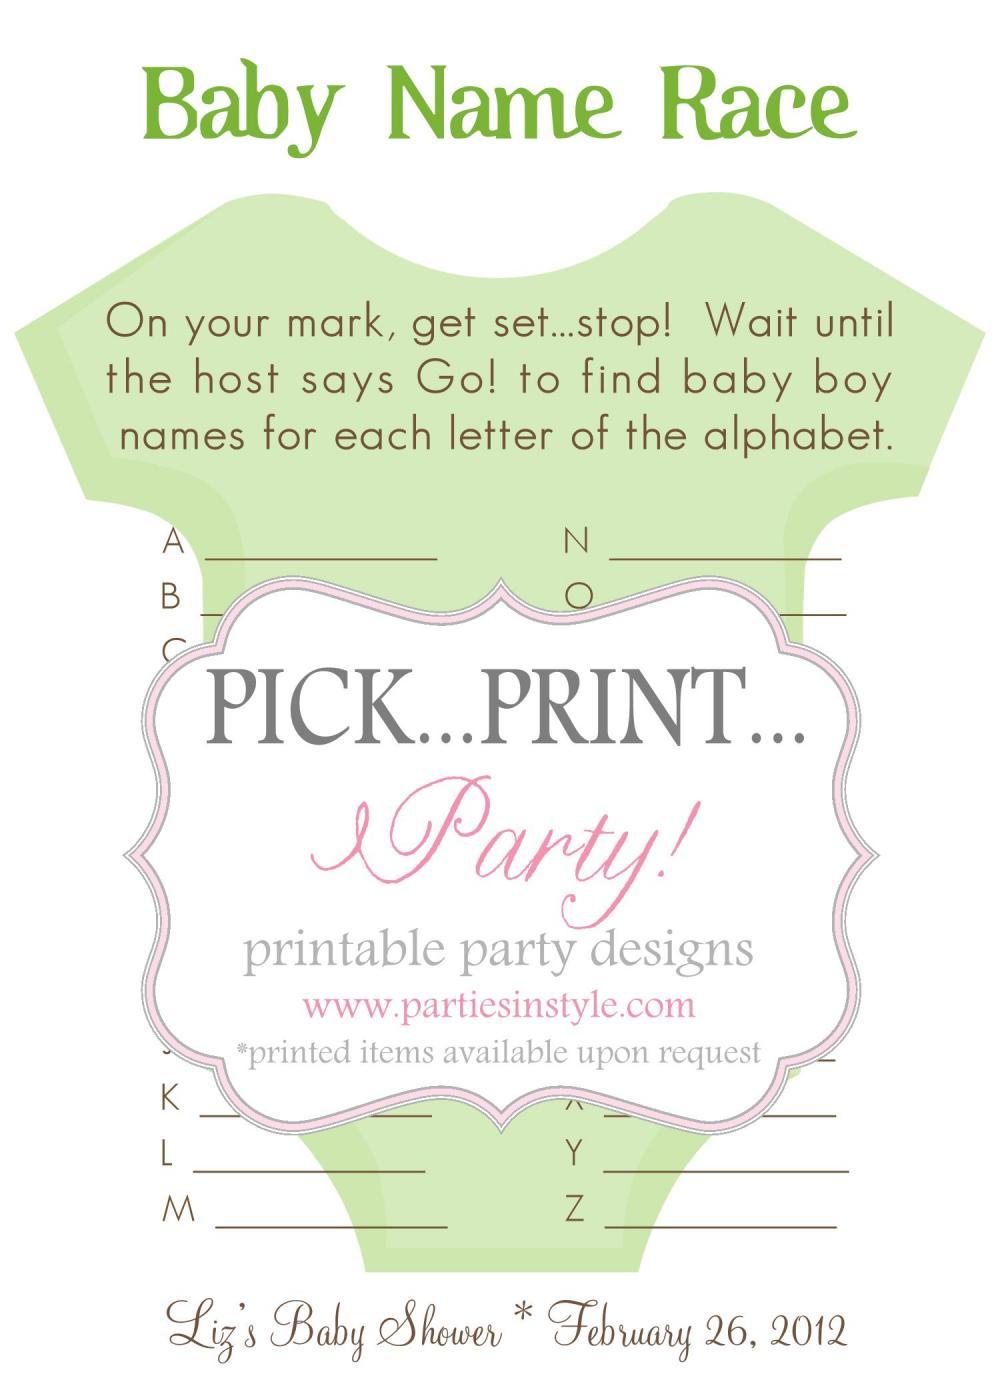 Baby Shower Game - Baby Name Race - Printable DIY